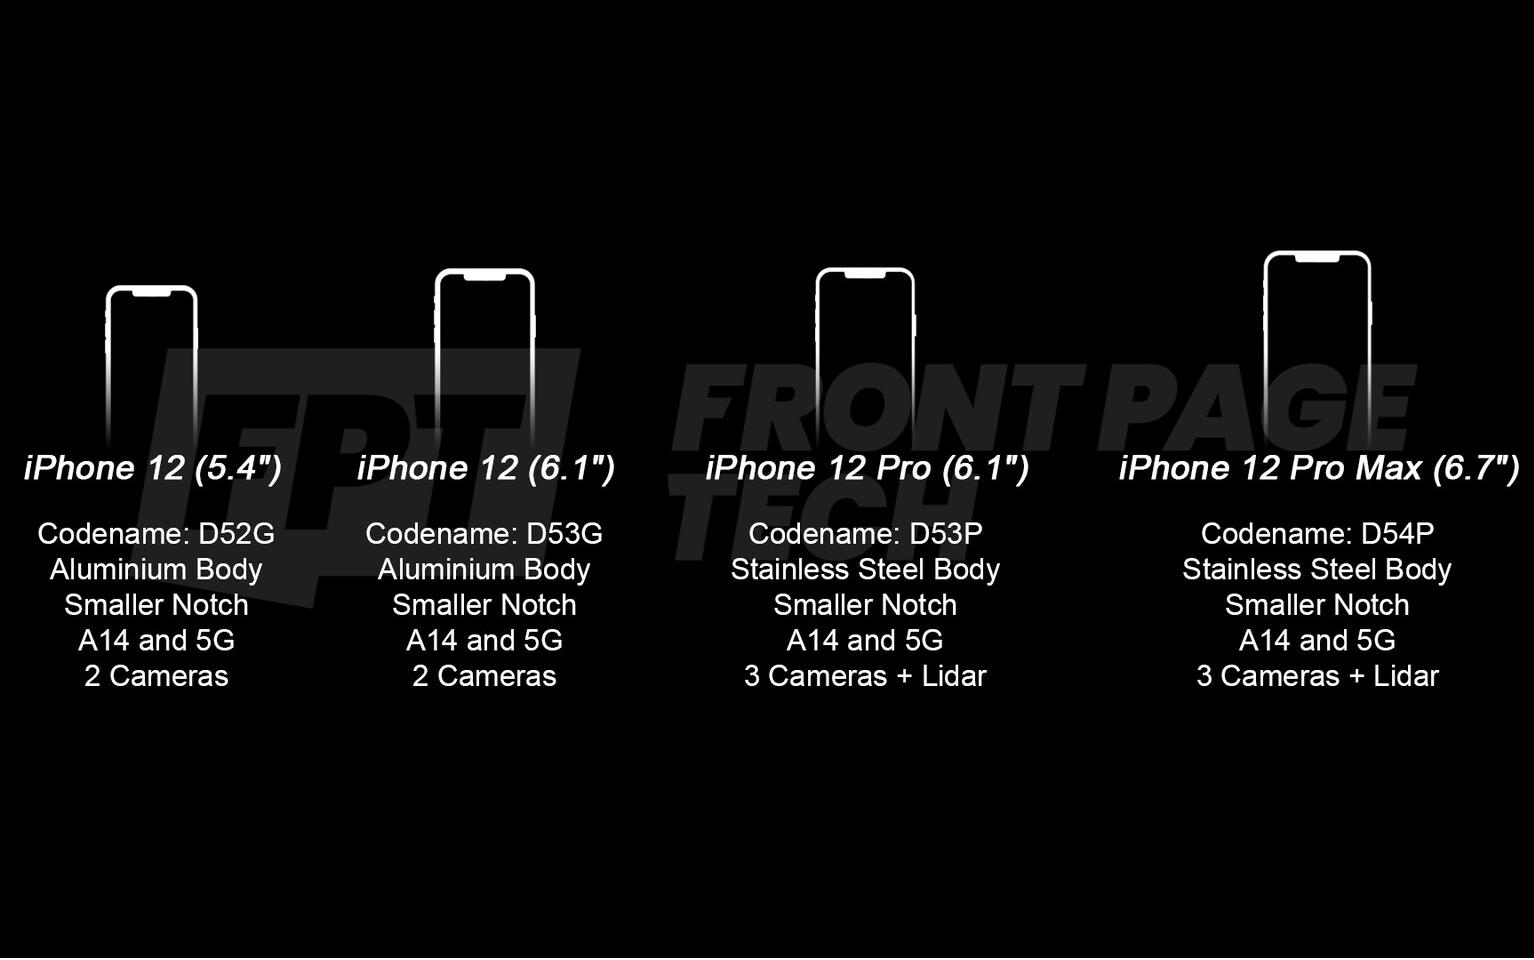 Latest iPhone 12 leak showcases screen sizes, LiDAR sensor, camera setup, and more